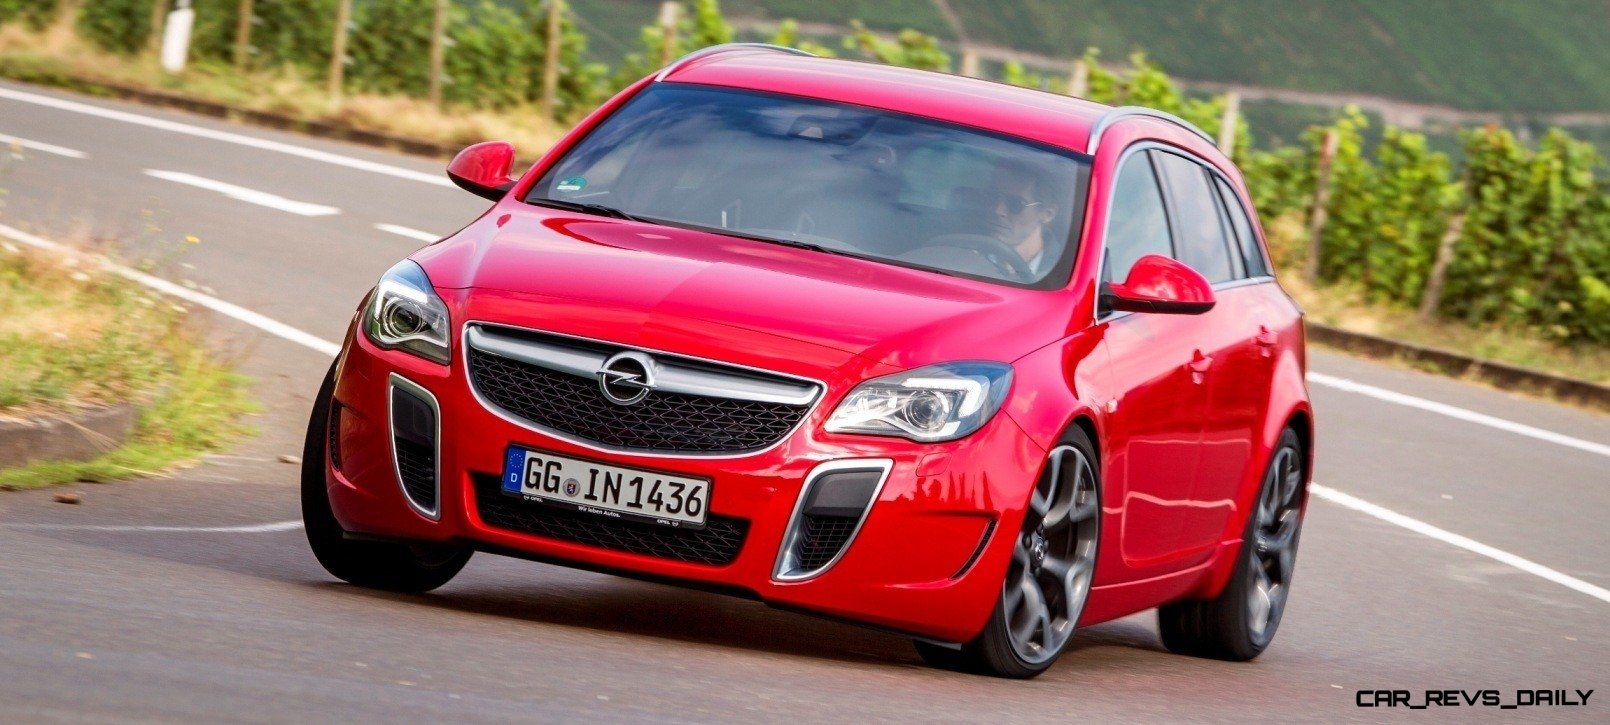 Opel-Insignia-OPC-287798(1)